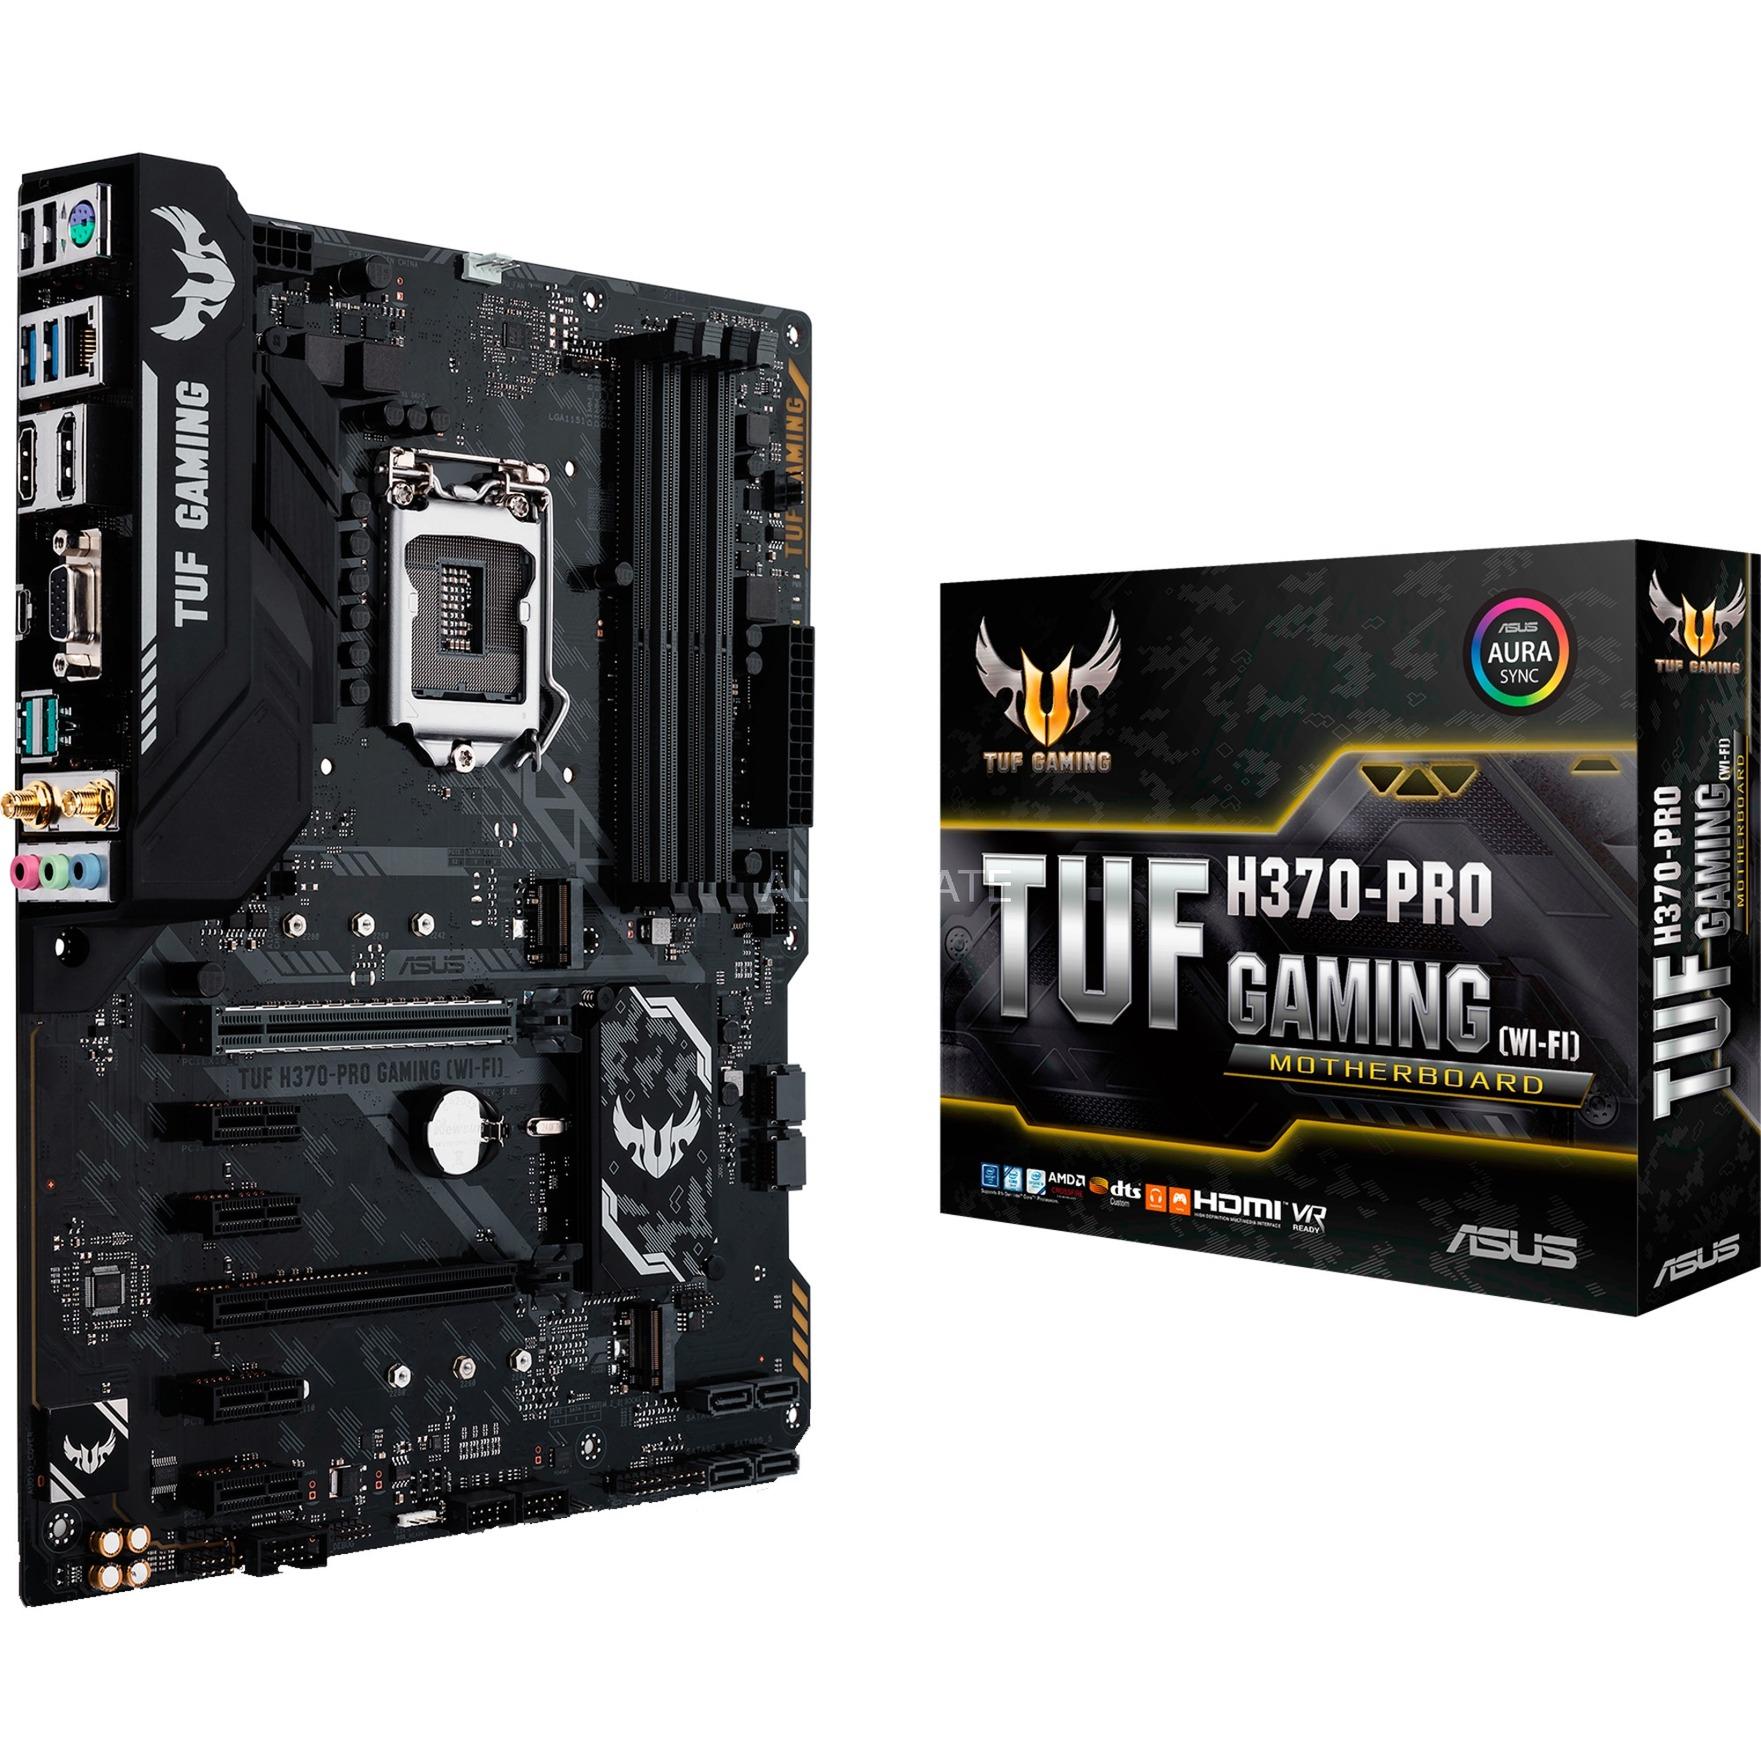 TUF H370-PRO GAMING (WiFi), Carte mère